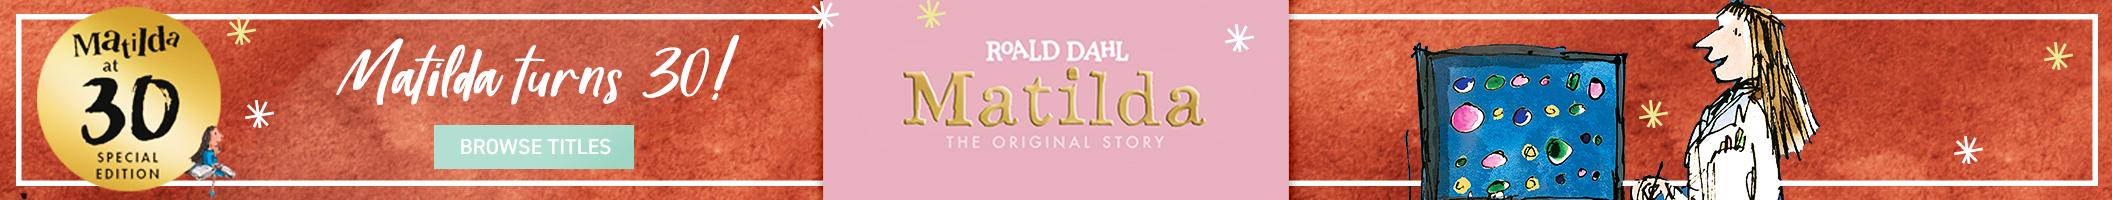 Matilda Turns 30 Homepage Banner 2112x200